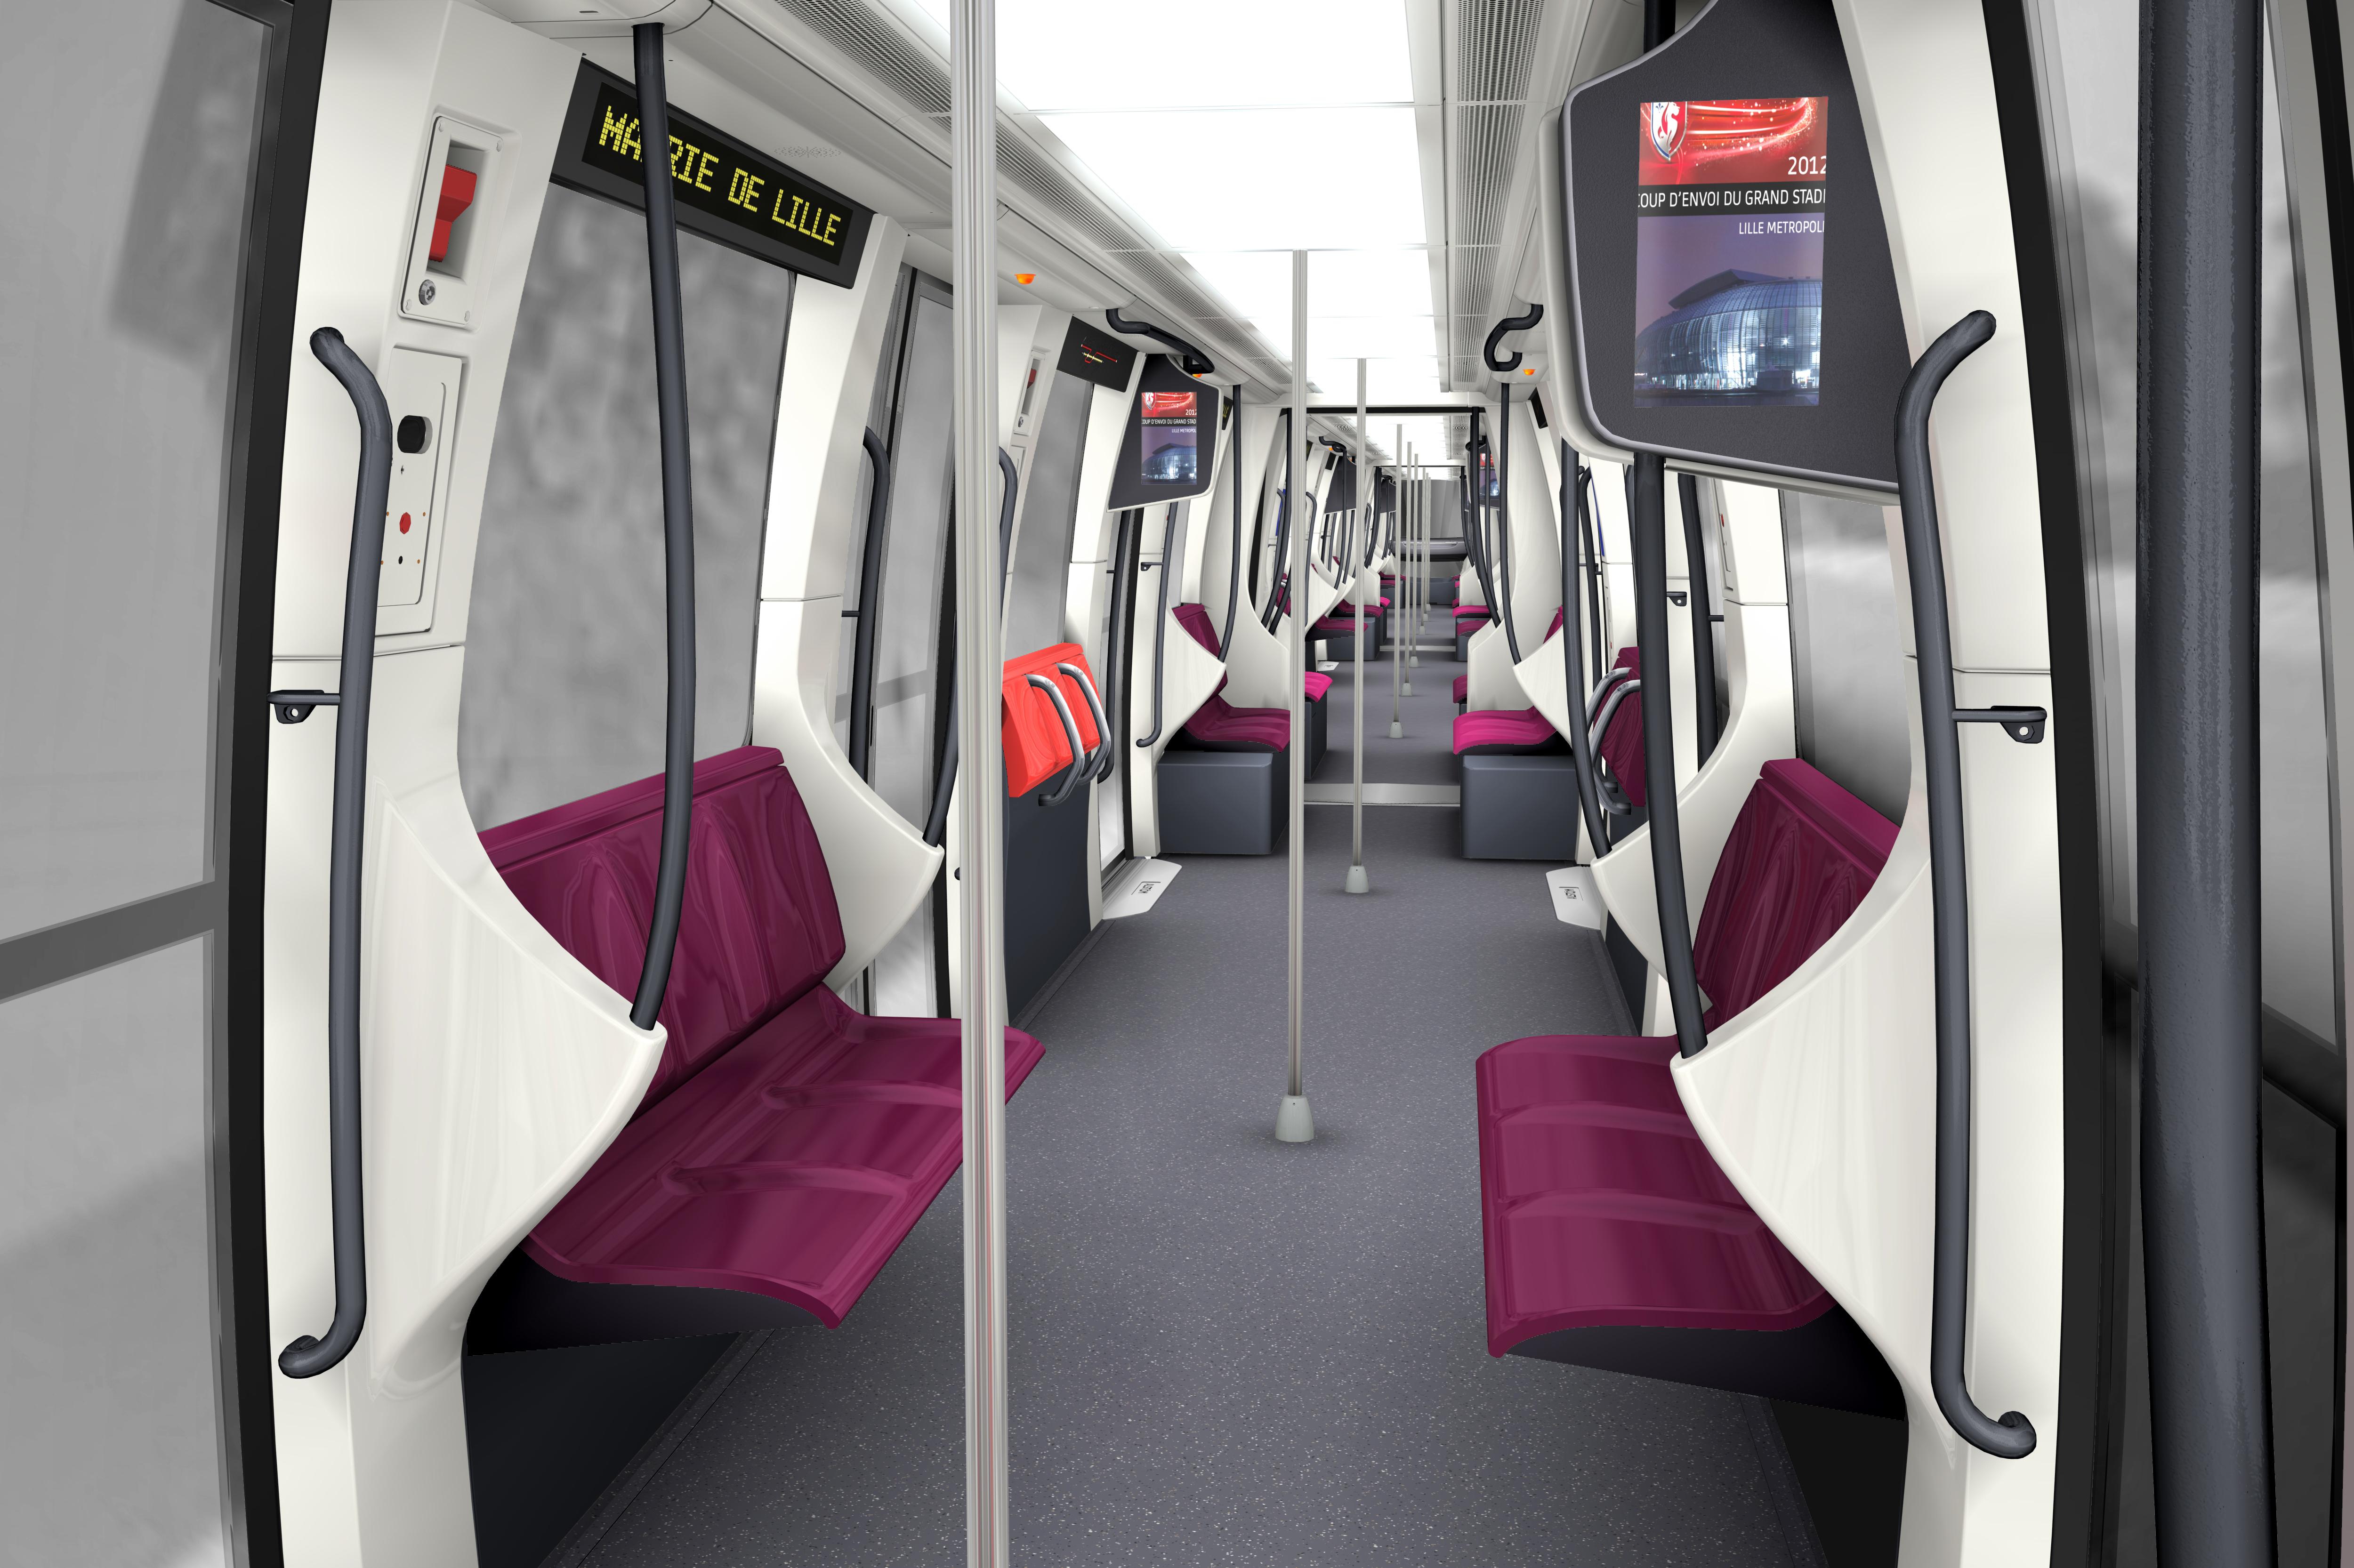 Metro LILLE